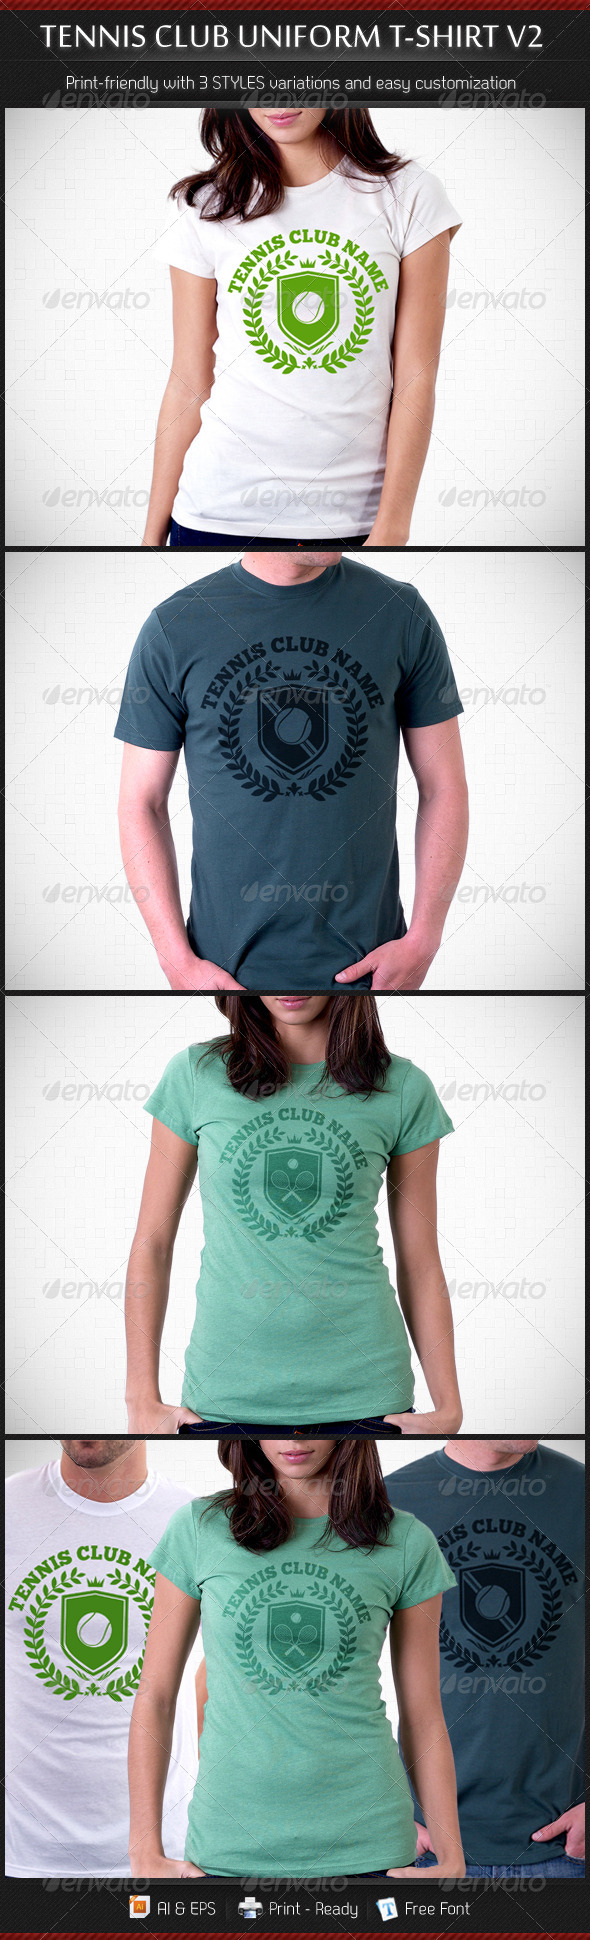 Tennis Club Uniform T-Shirt Template V2 - Sports & Teams T-Shirts